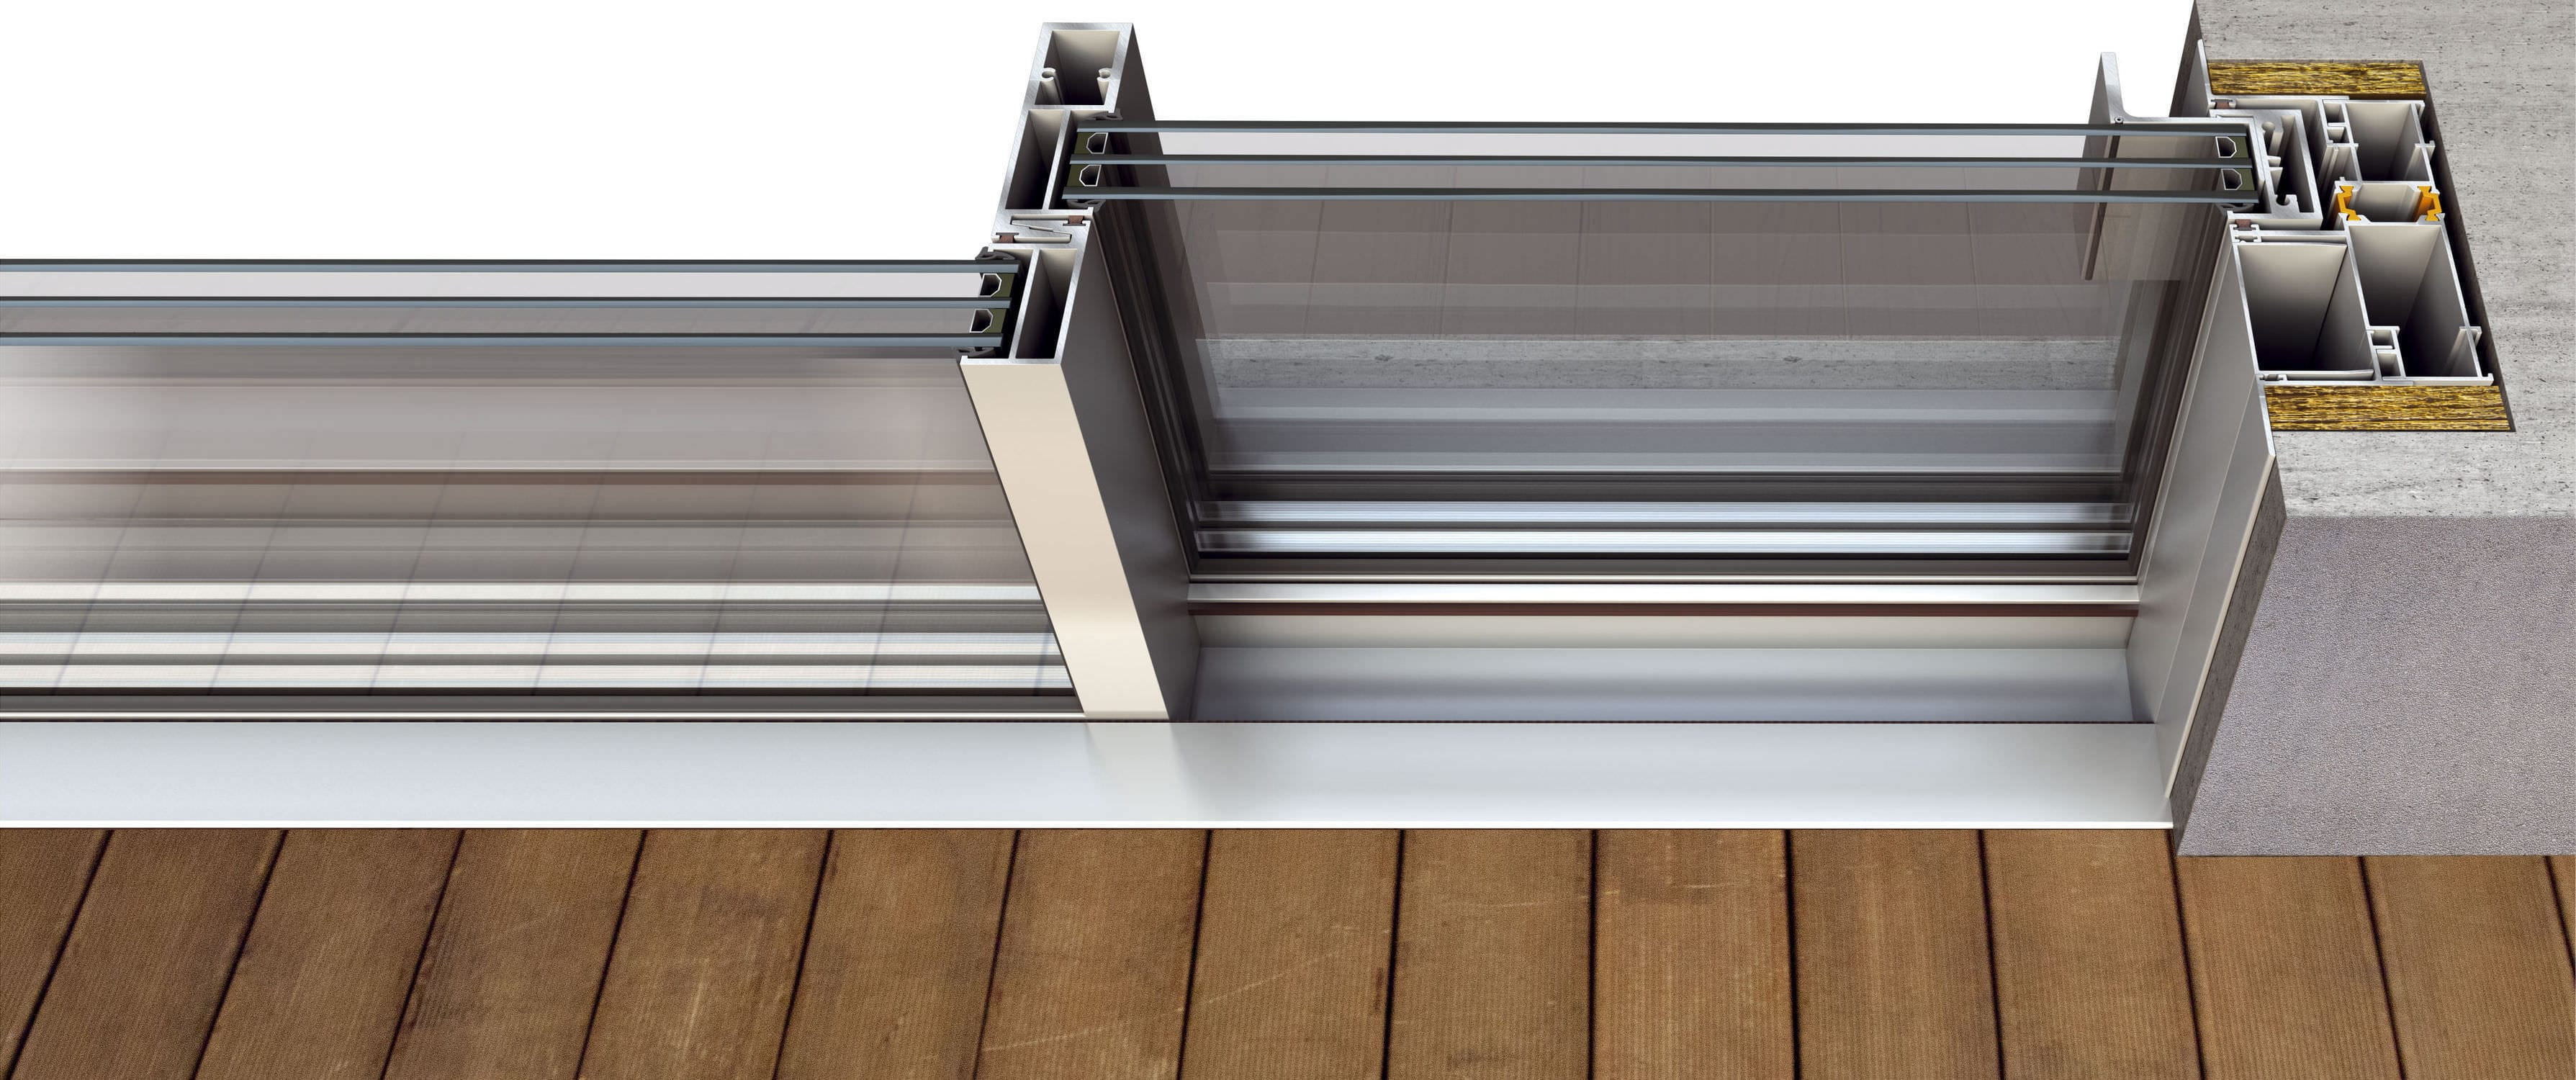 Ventanal corredero / de aluminio / con vidrio triple - FLUO - Aldena